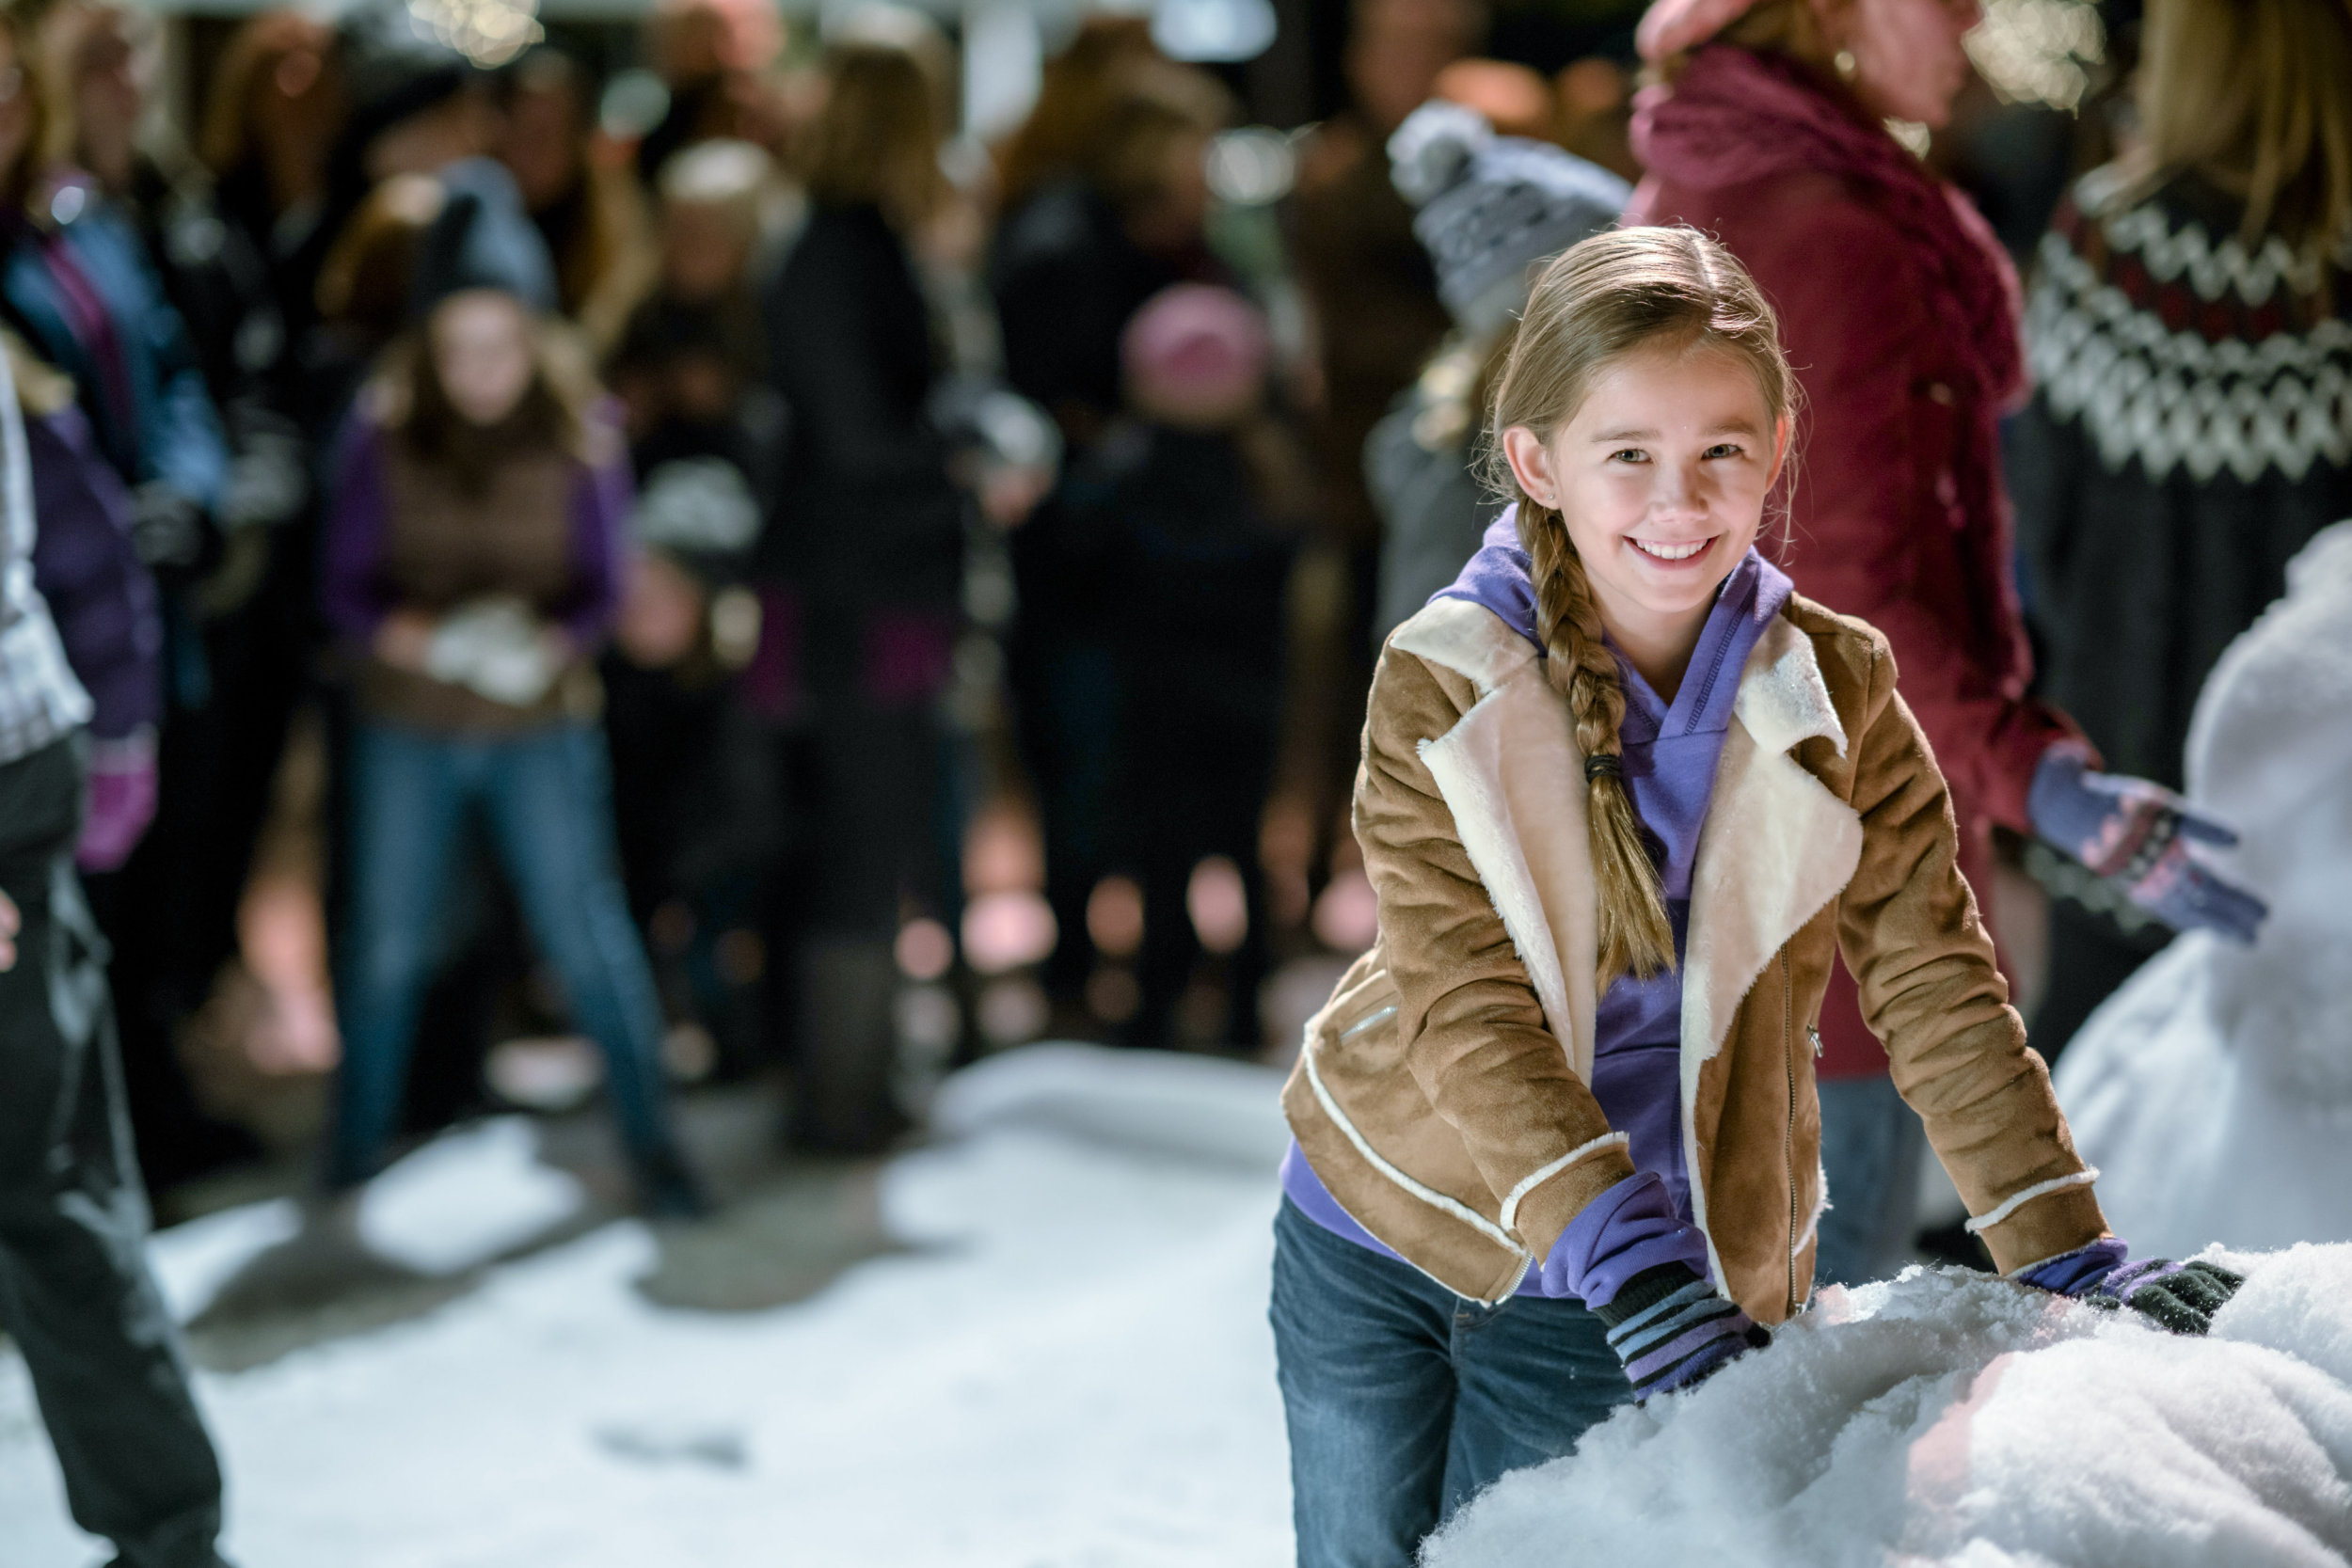 Taylor Cole Christmas In Homestead.Brooklyn Rae Silzer As Sophie On Christmas In Homestead